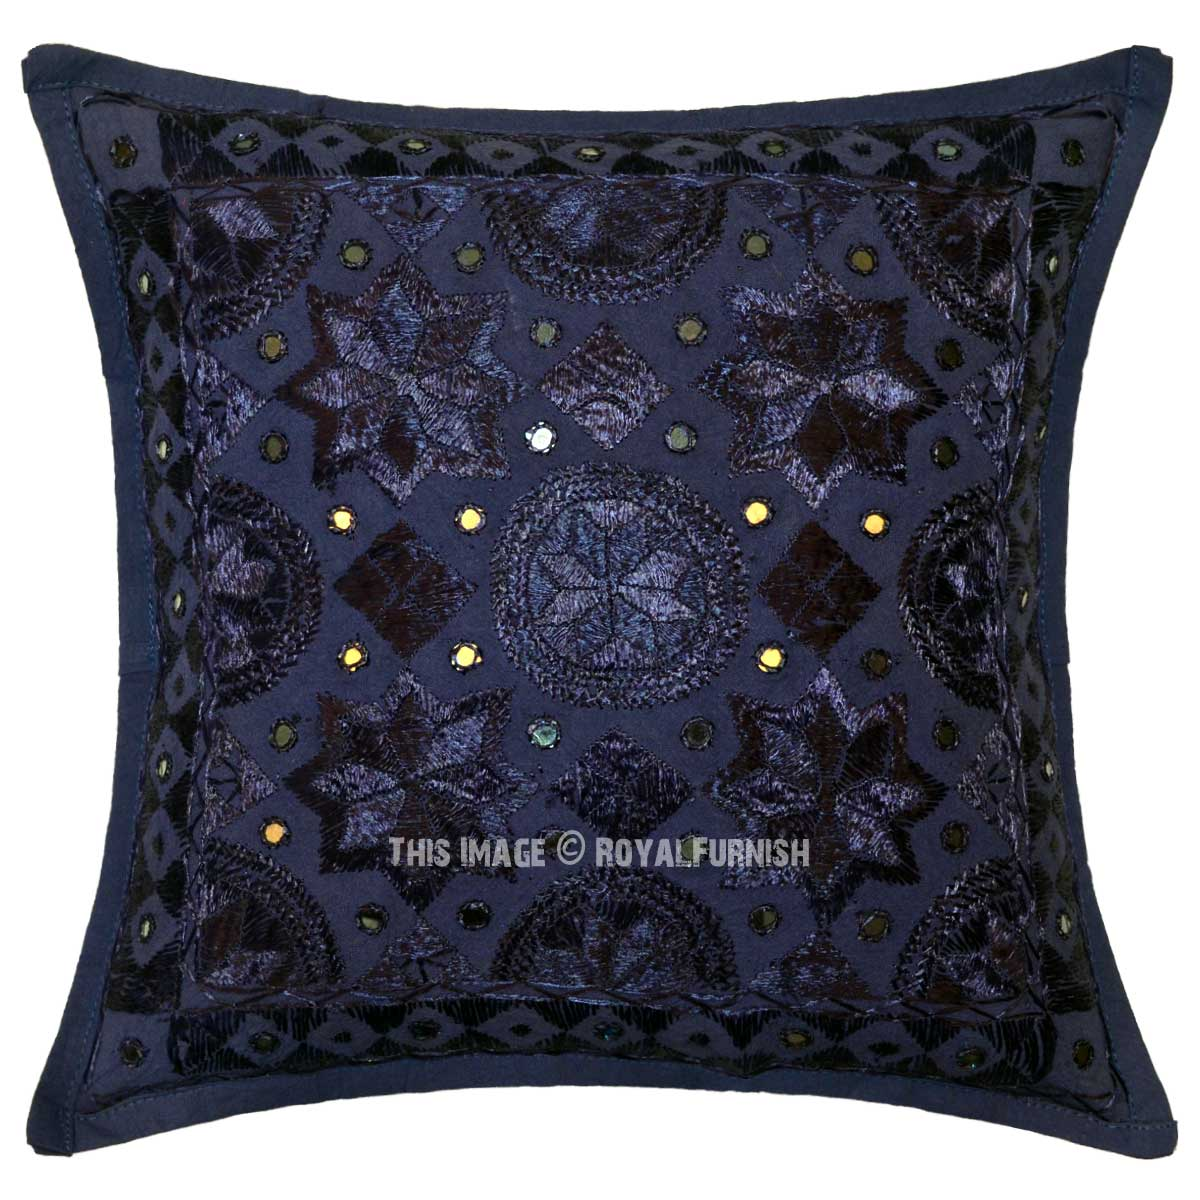 Blue Decorative Star Mirrored Unique Handmade Throw Pillow